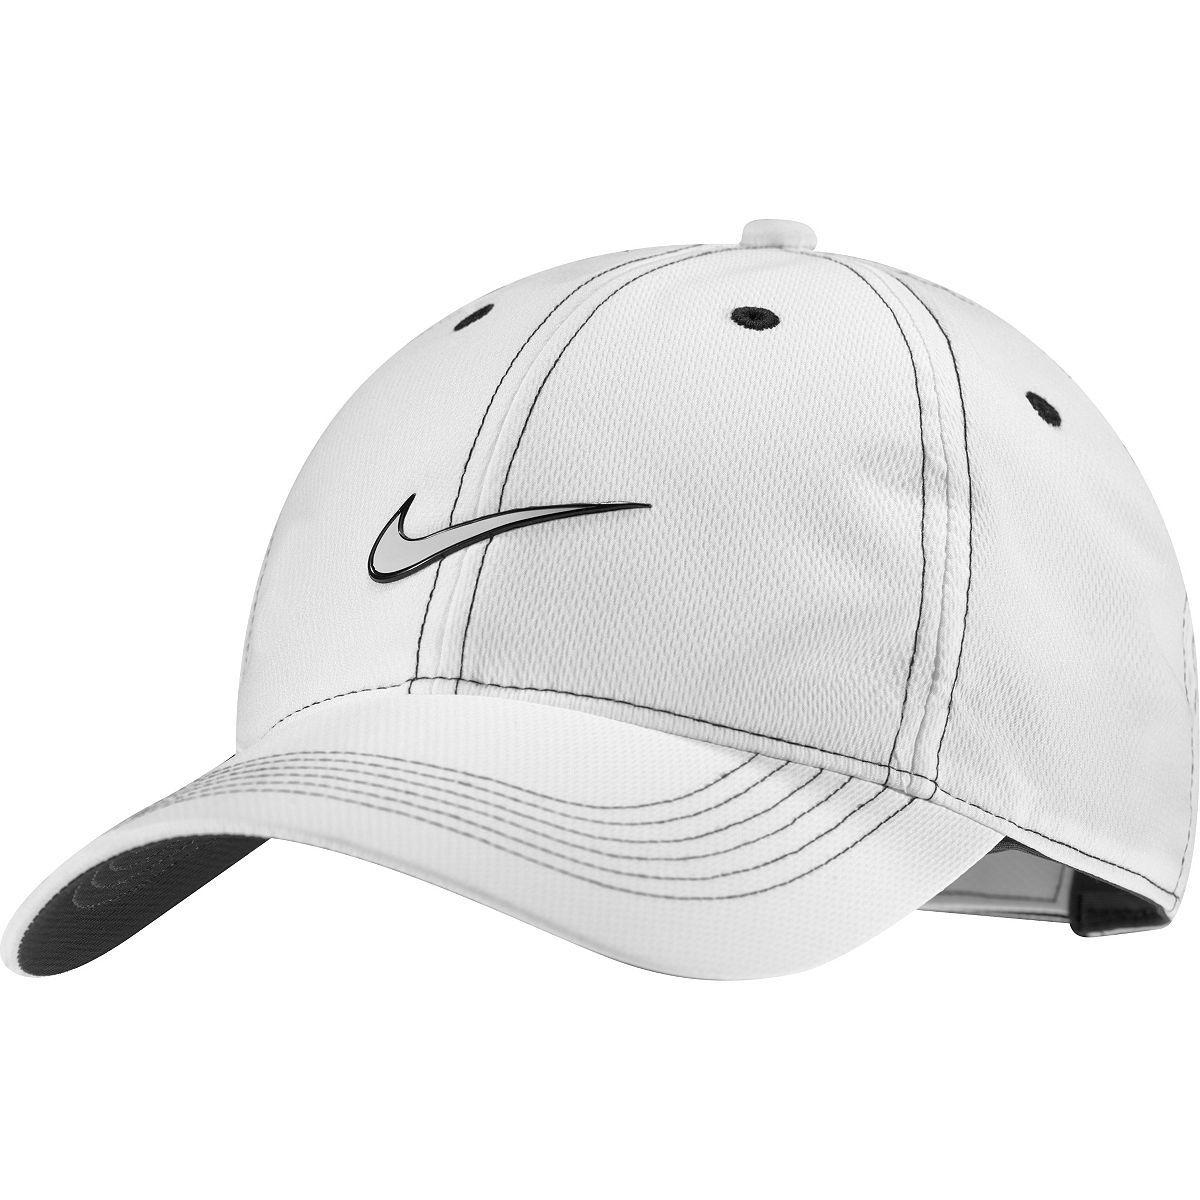 9a836bfc71d Nike Men s Closeout Contrast Stitch Cap at Golfsmith.com